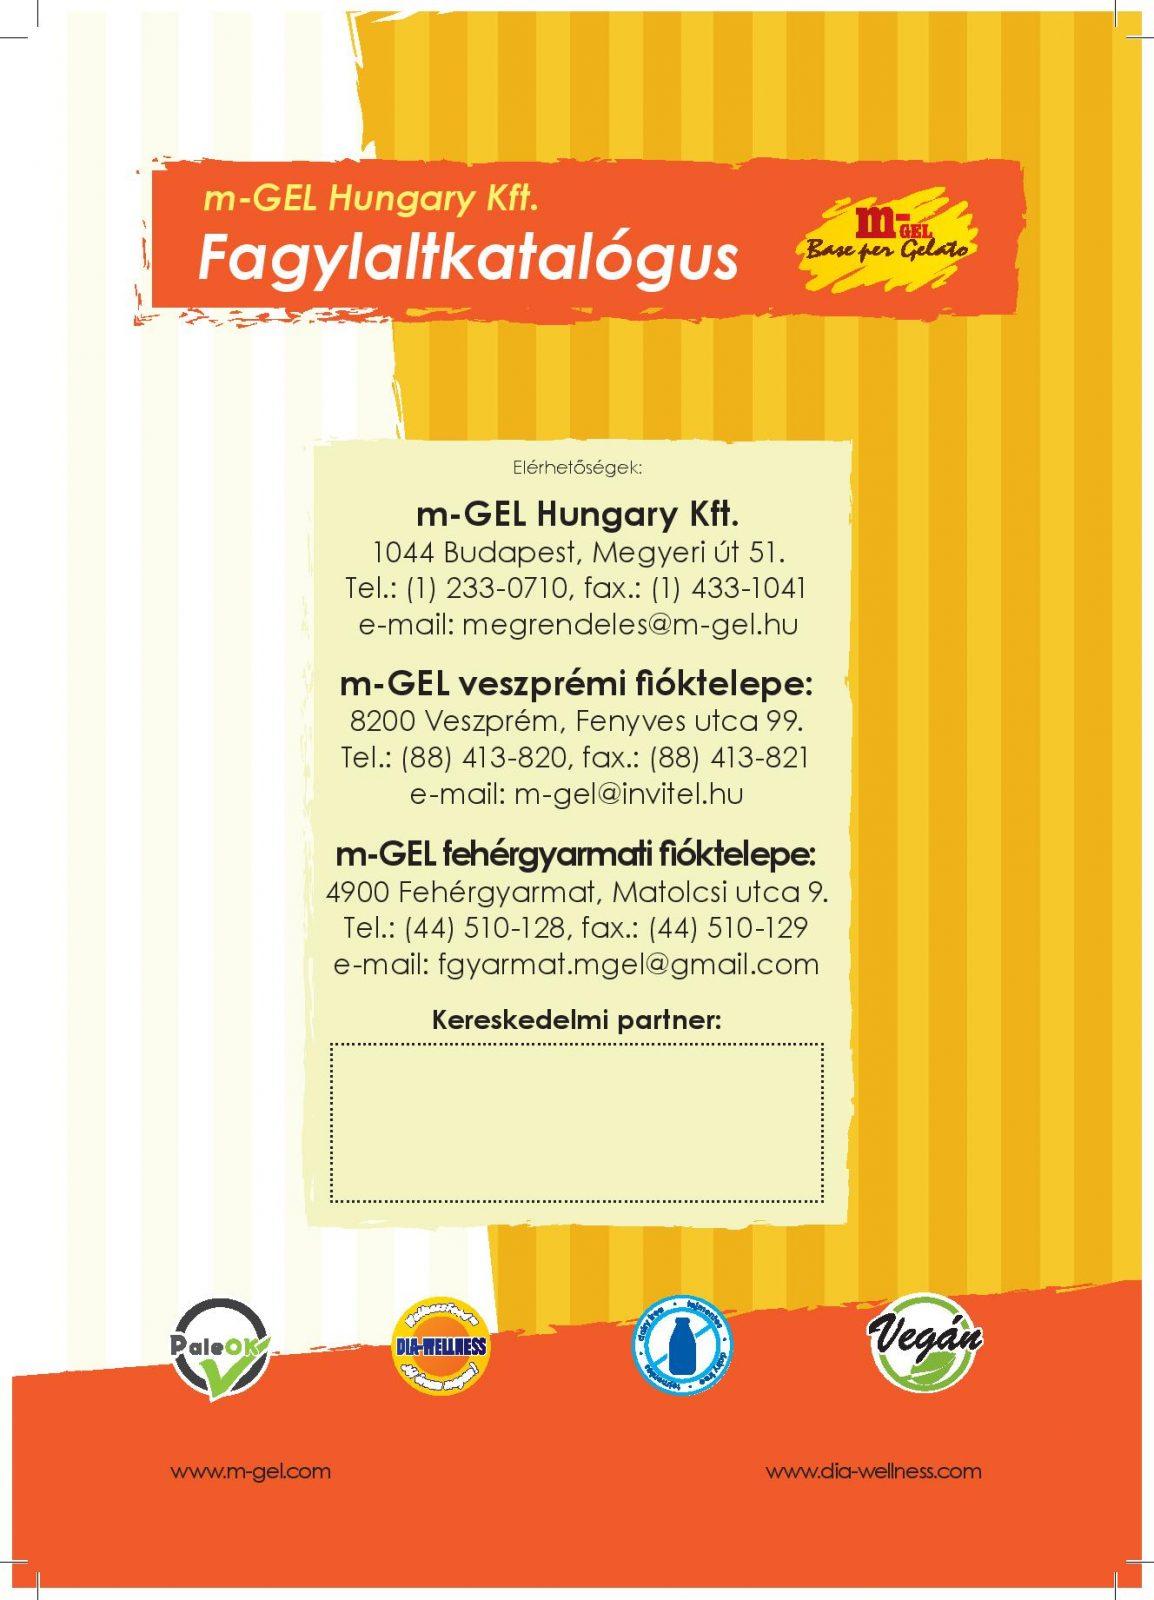 FAGYLALTKATALOGUS_2021_PRINT-page-024